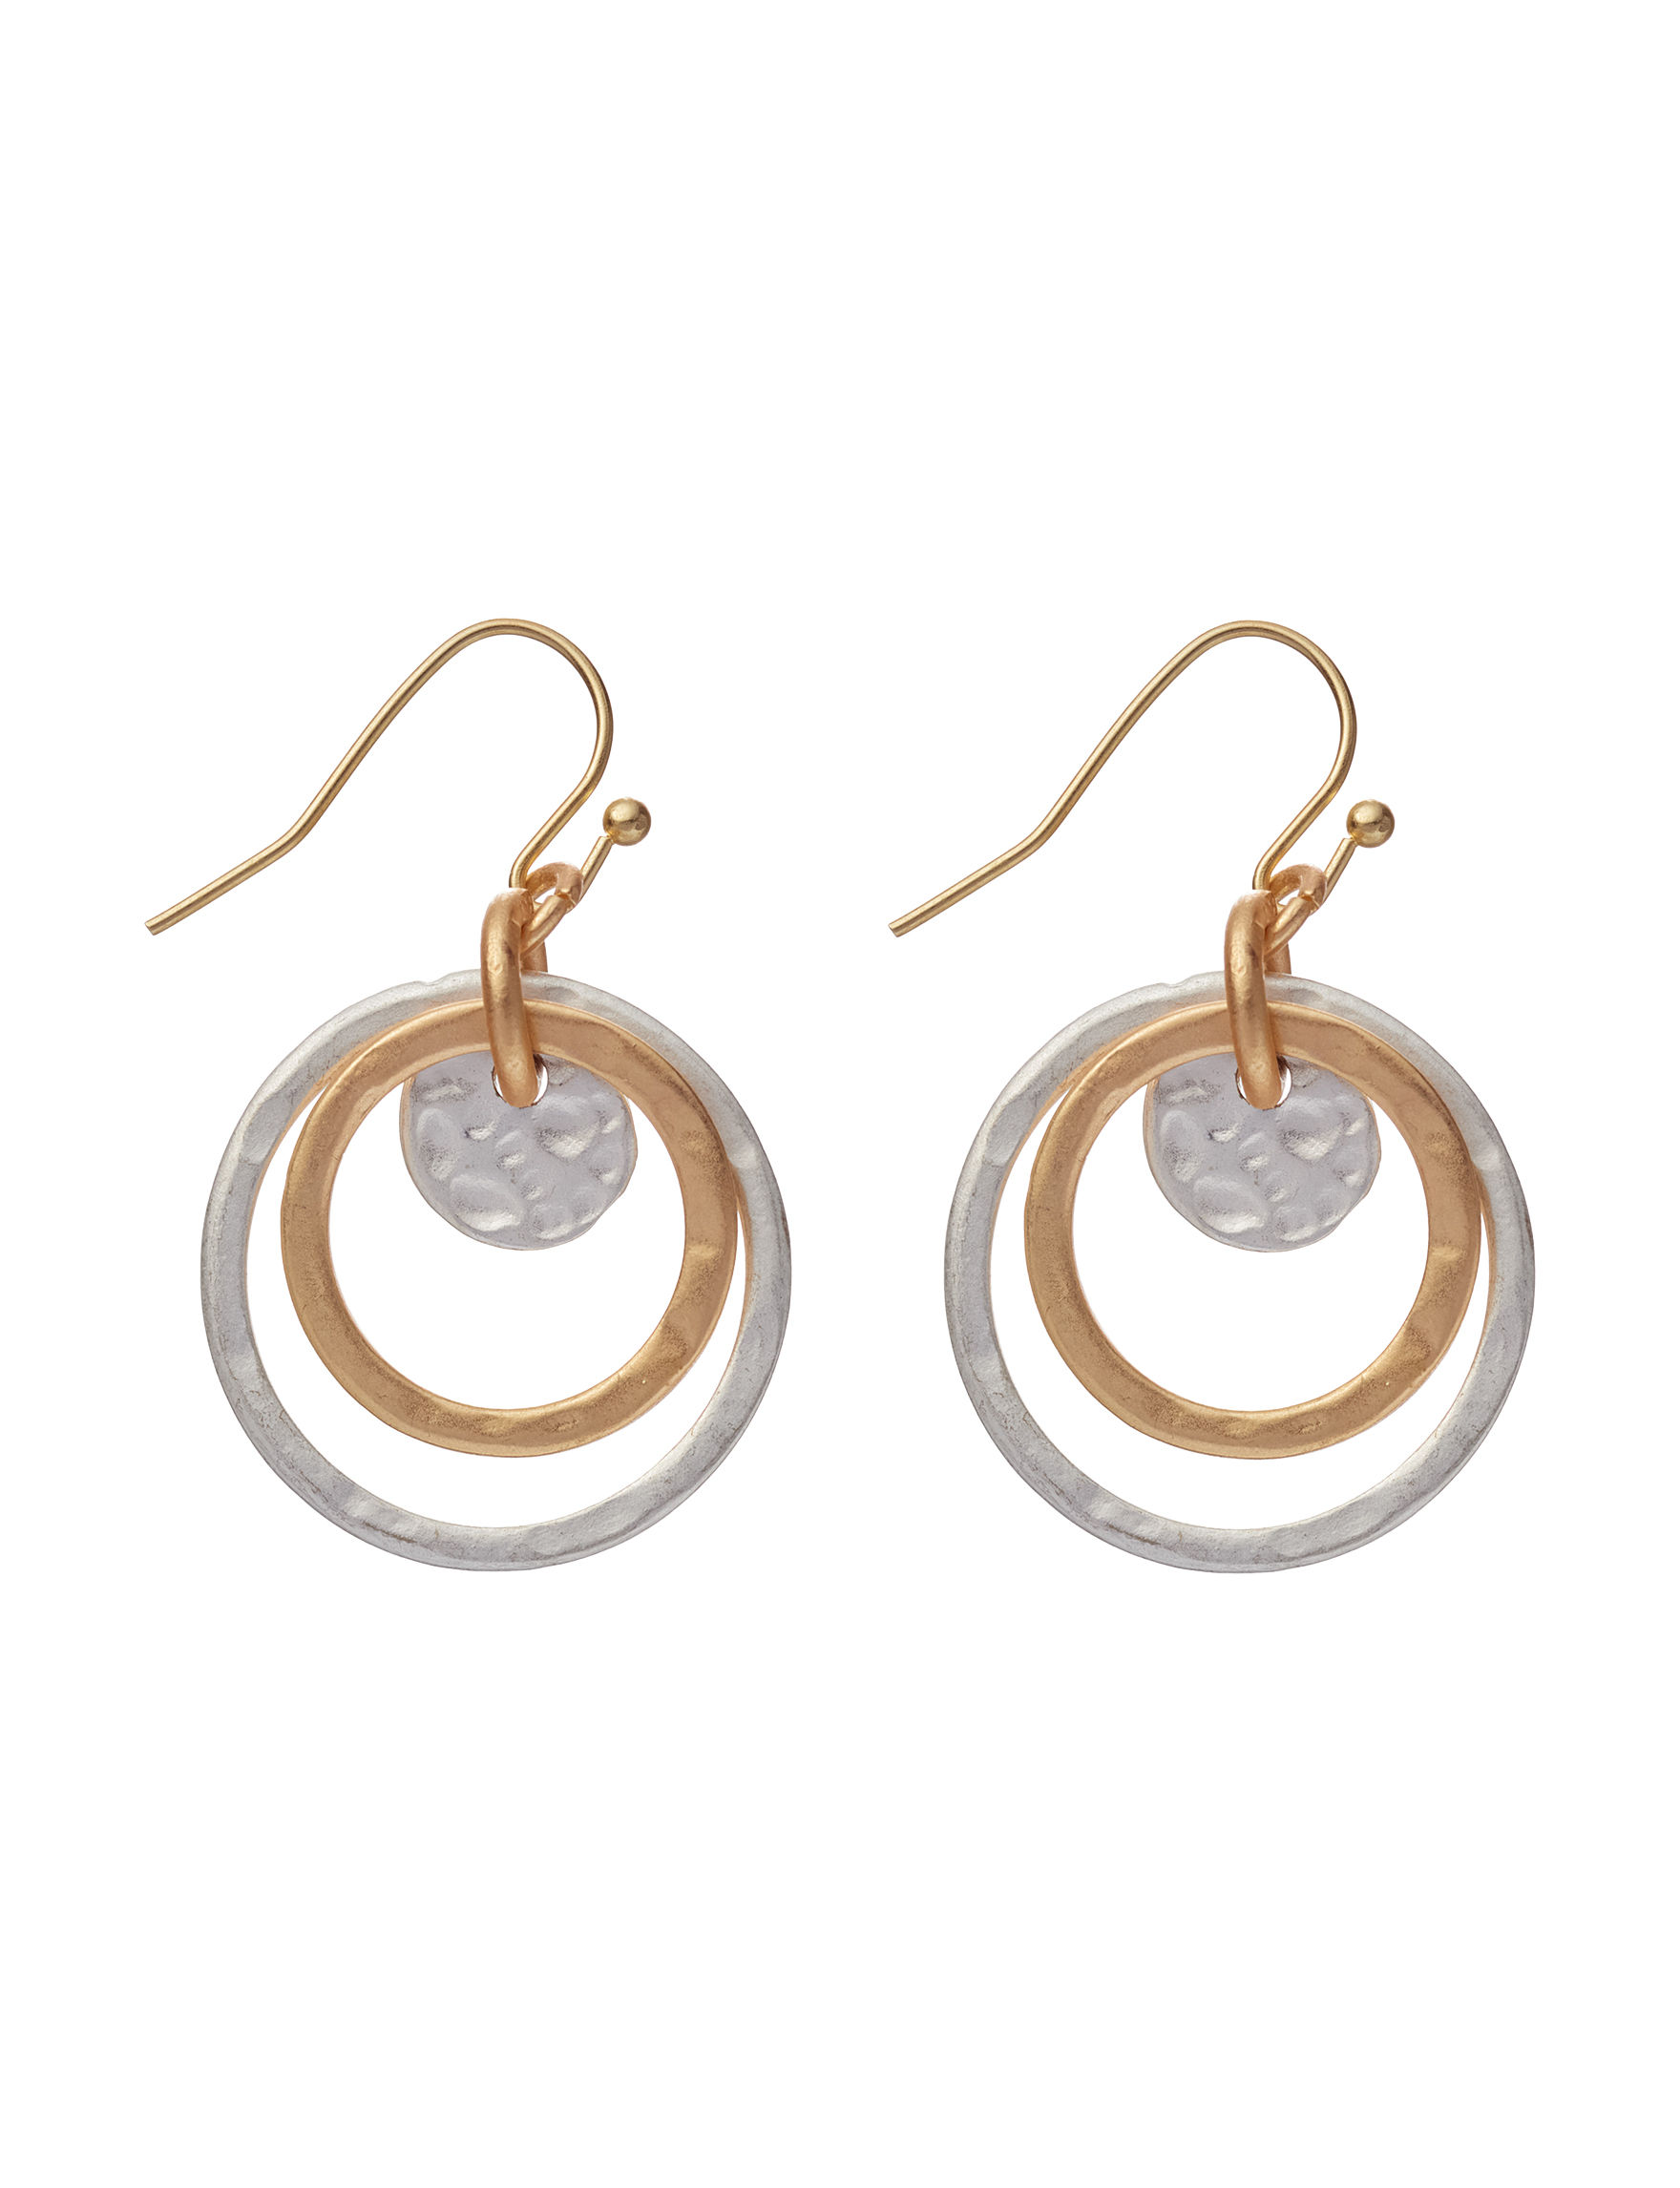 Hannah Silver / Gold Drops Earrings Fashion Jewelry